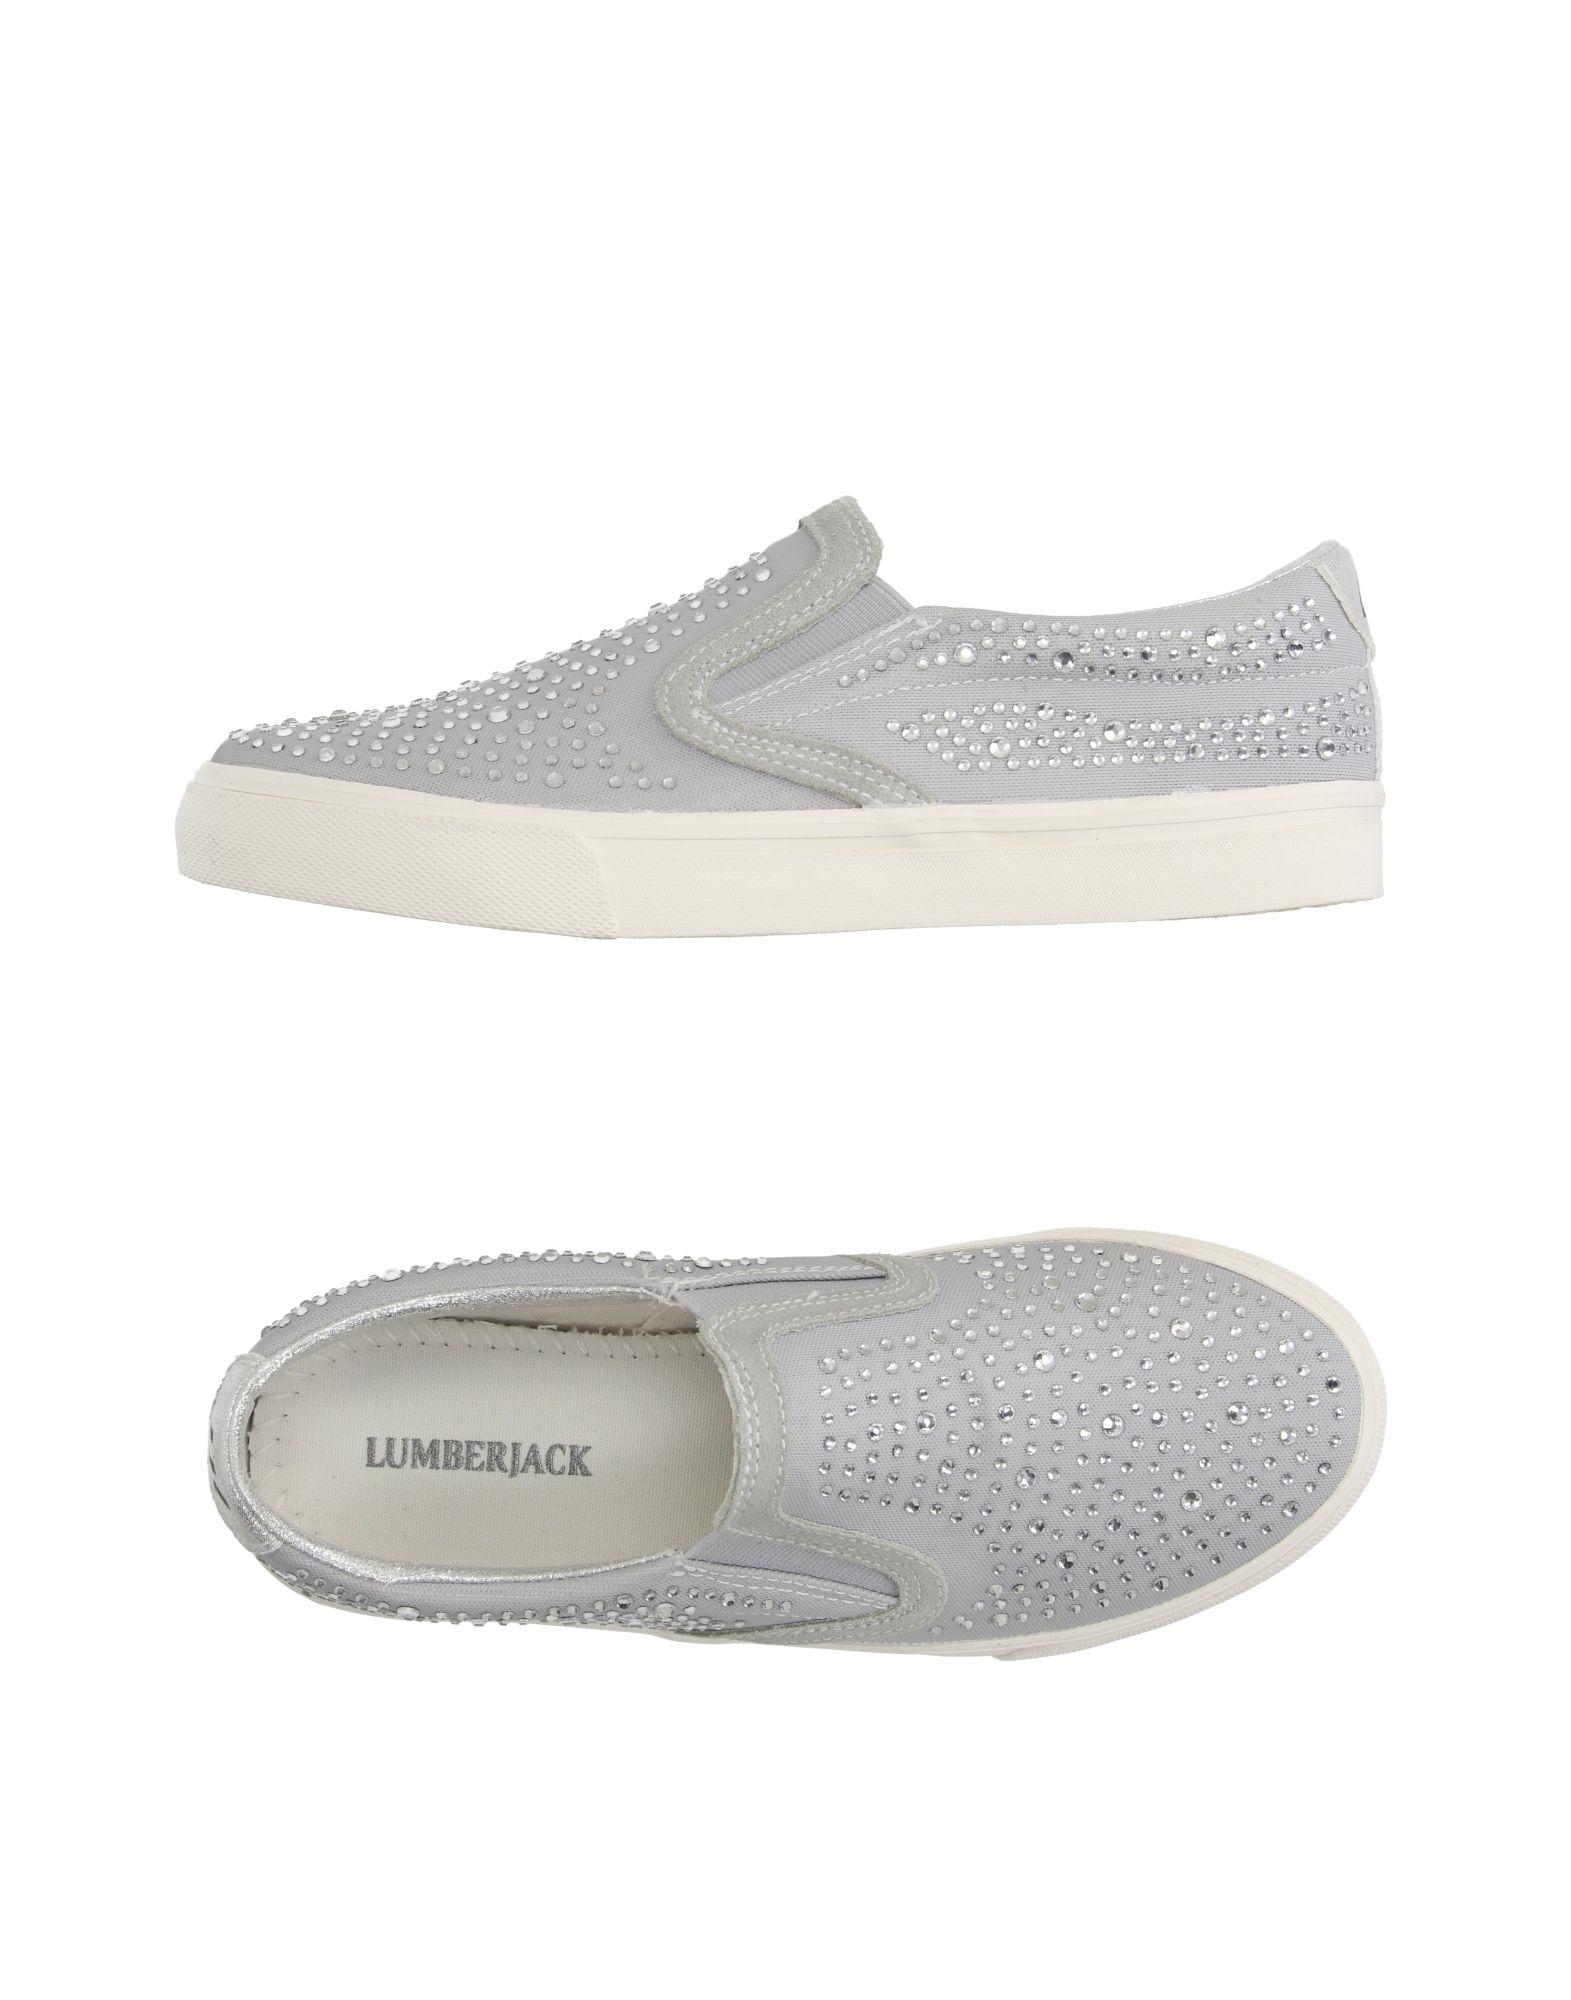 Lumberjack Sneakers - Women Lumberjack Sneakers online 11197898QK on  Australia - 11197898QK online 41778e